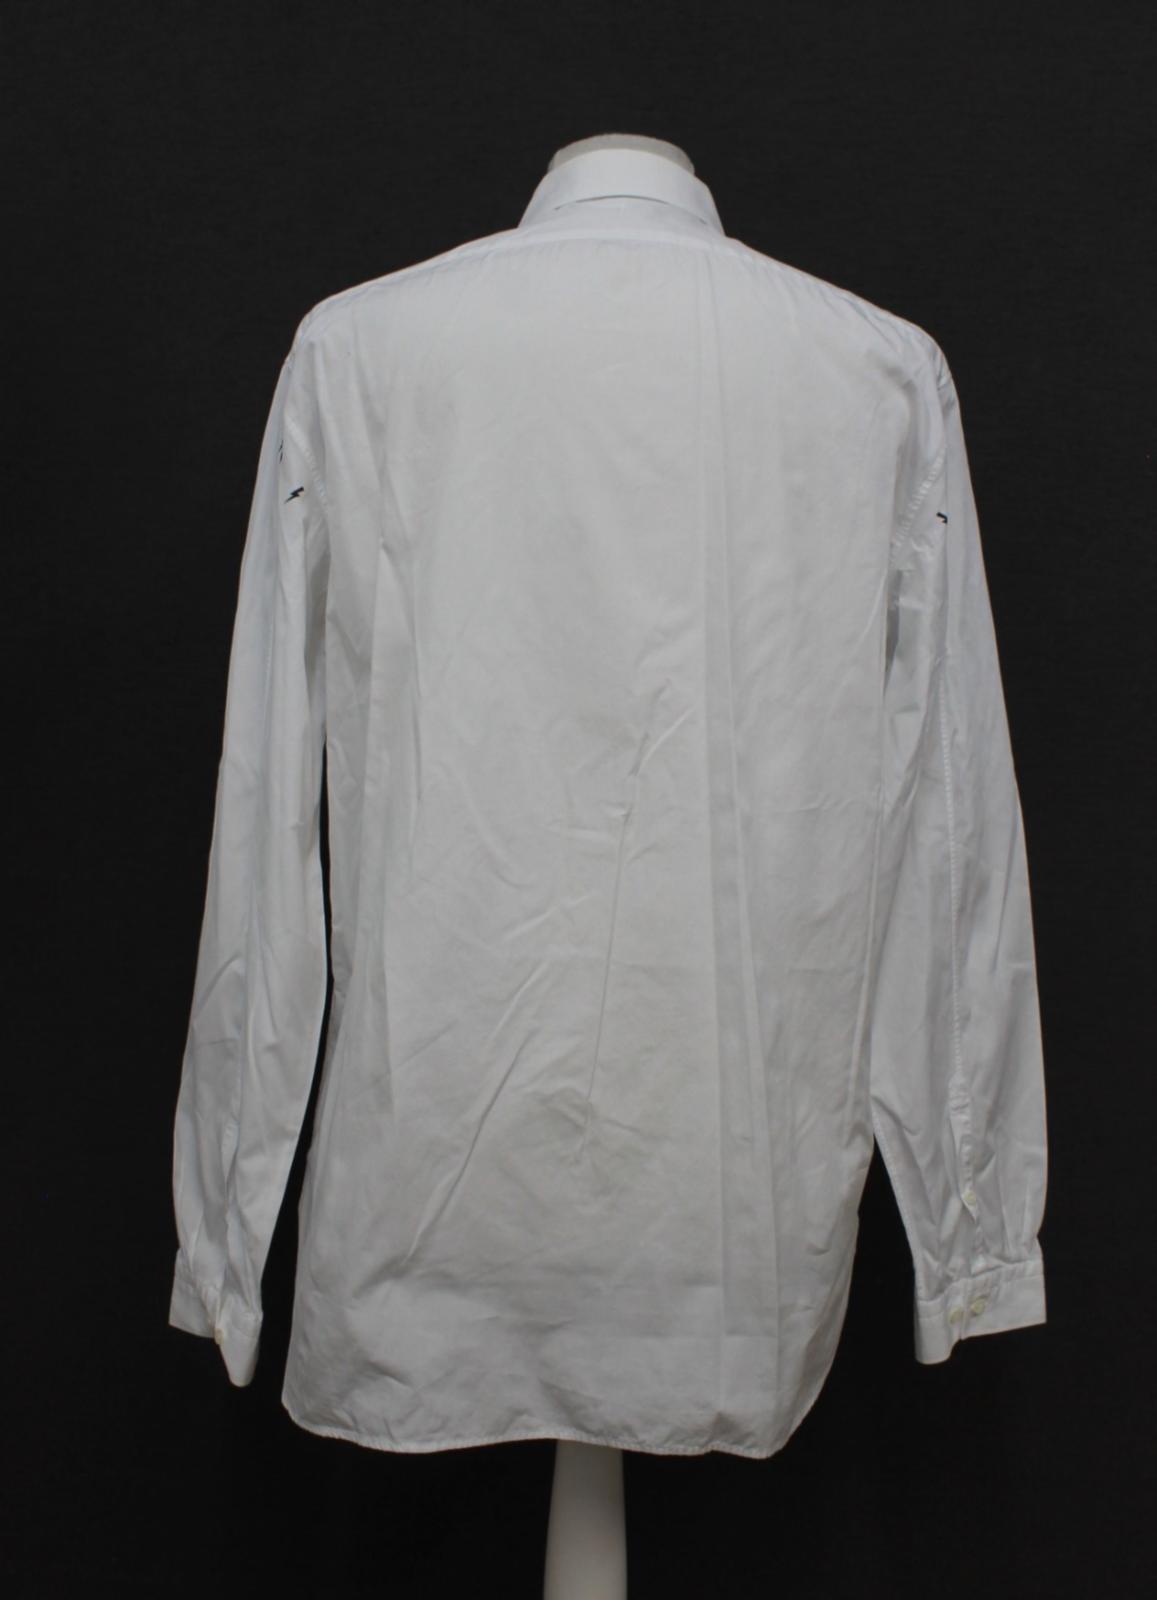 Neil-barrett-hombre-blanco-de-algodon-manga-de-Rayo-con-cuello-camisa-tamano-17-5-034 miniatura 5